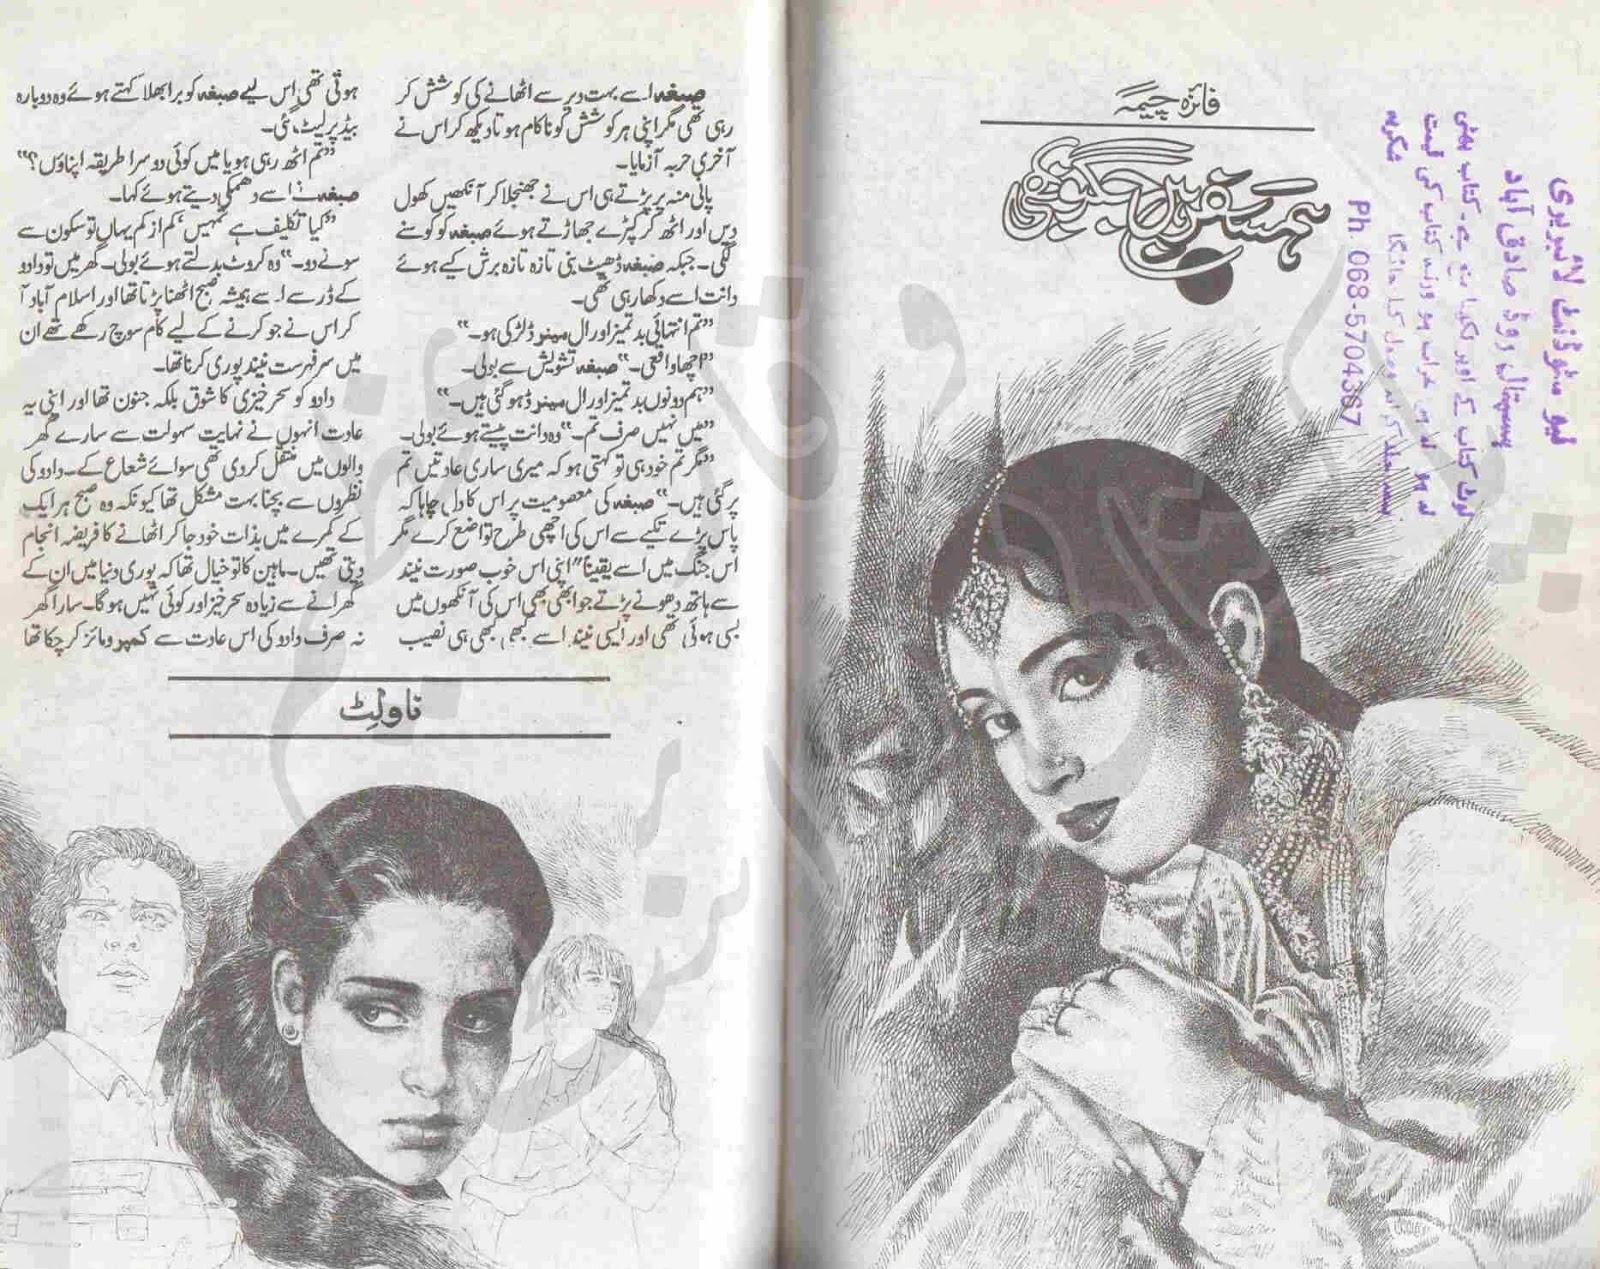 Kitab Dost Humsafar Hain Jugnoo Bhi Novel By Faiza Cheema Online